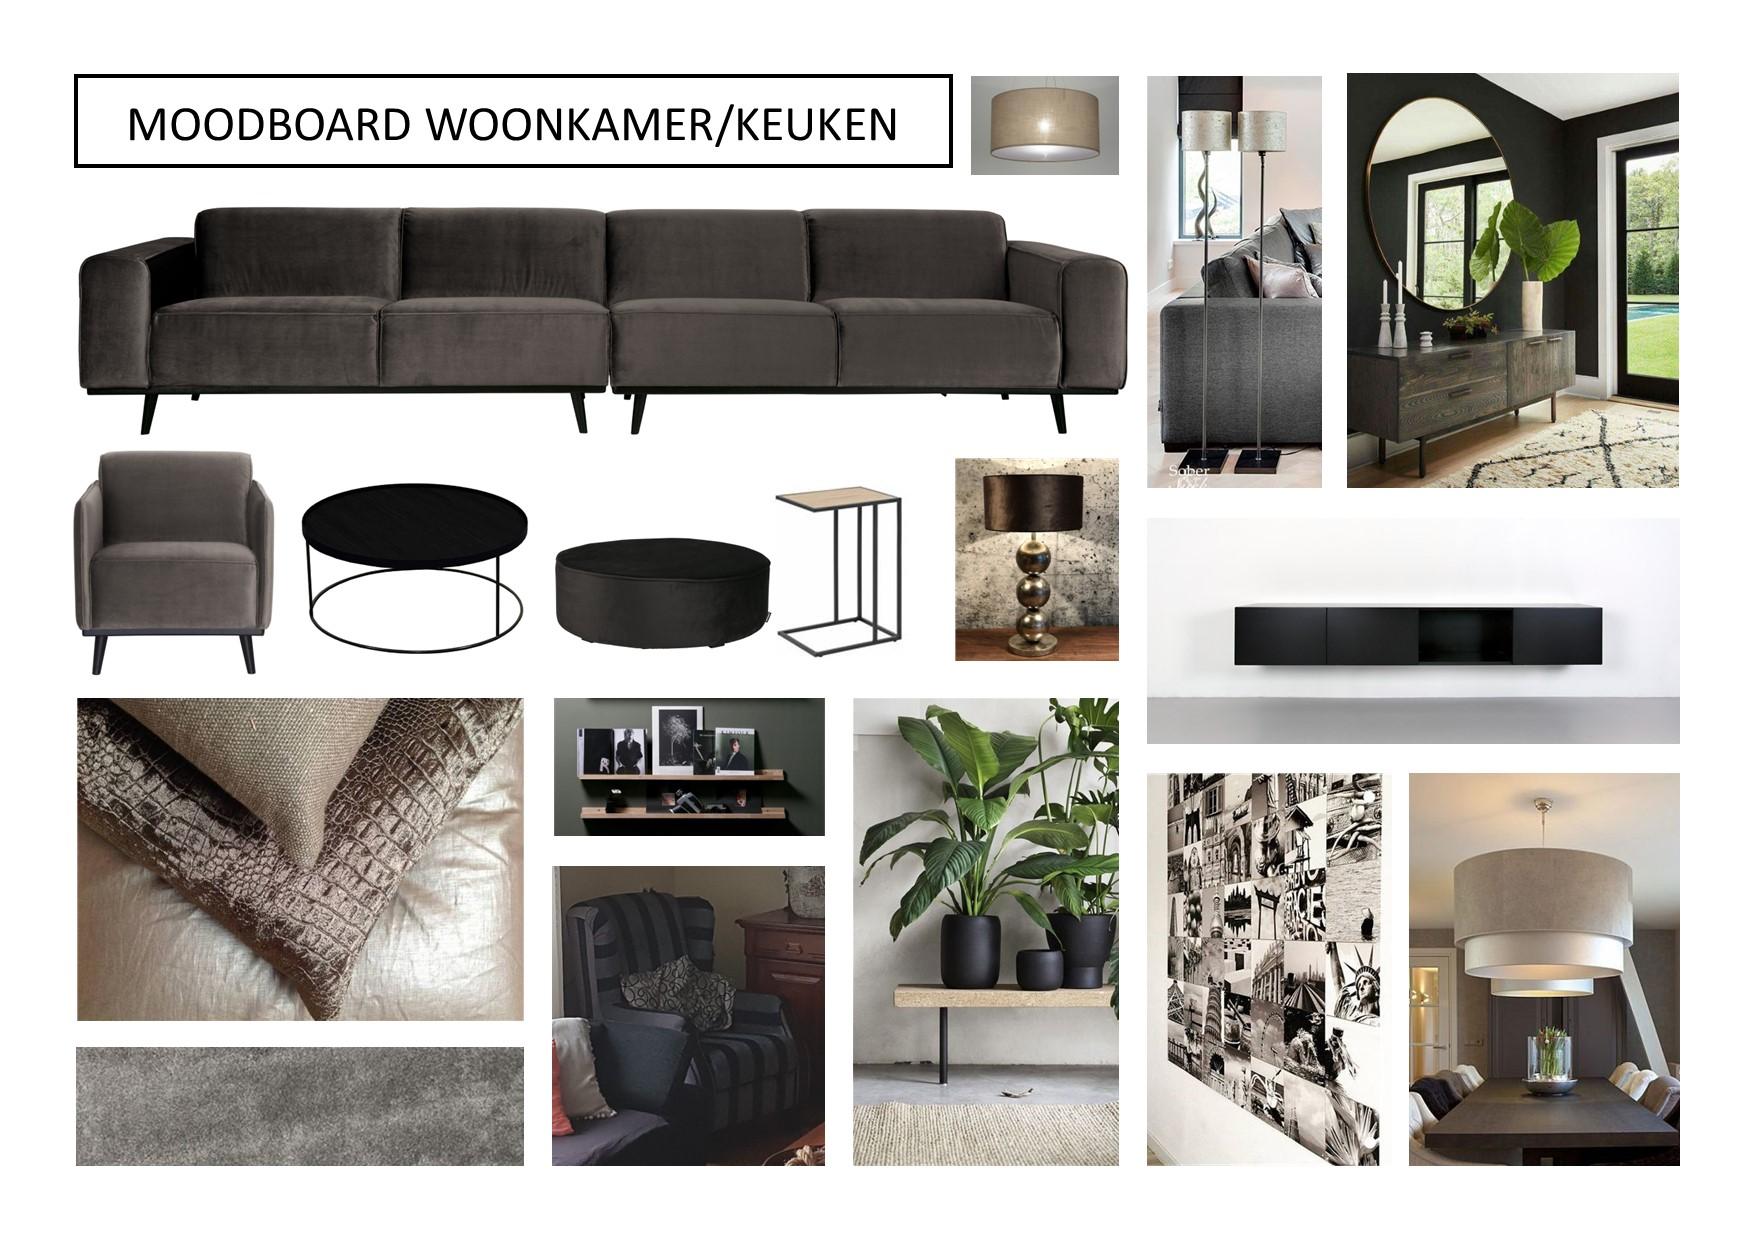 Moodboard meubelplan